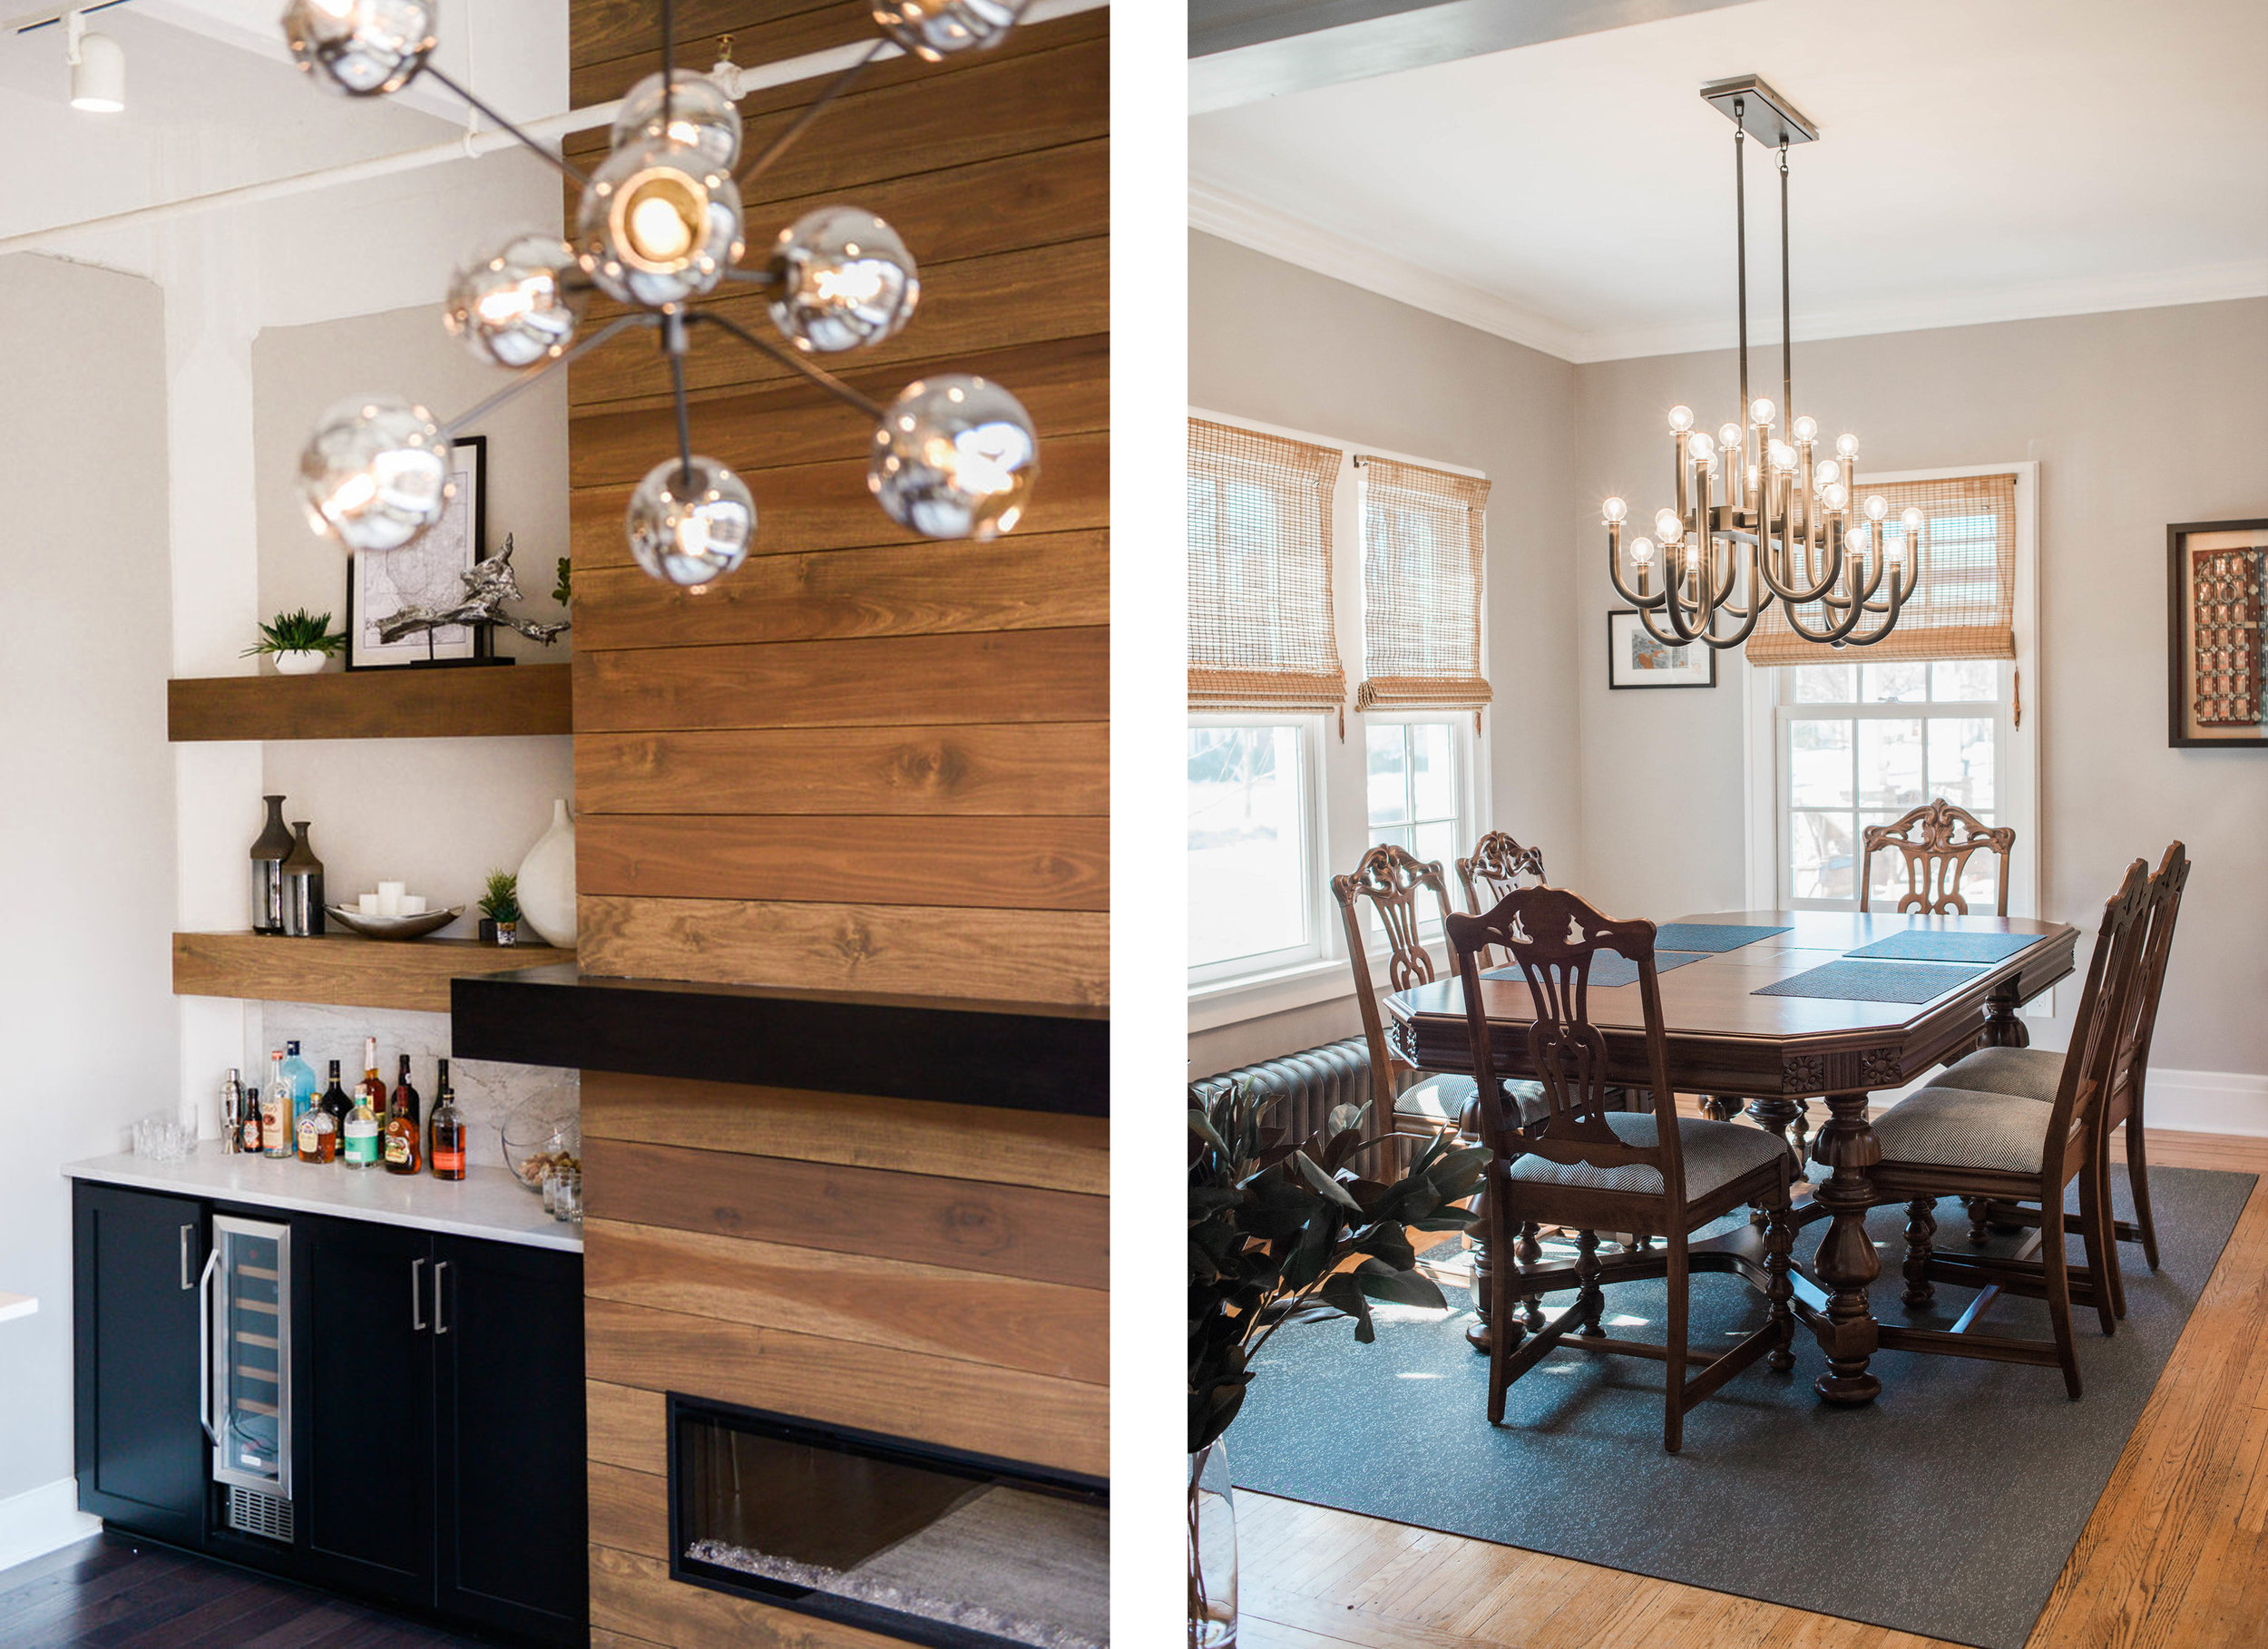 West End Interior Designer Buffalo NY - Light Fixtures 1.jpg